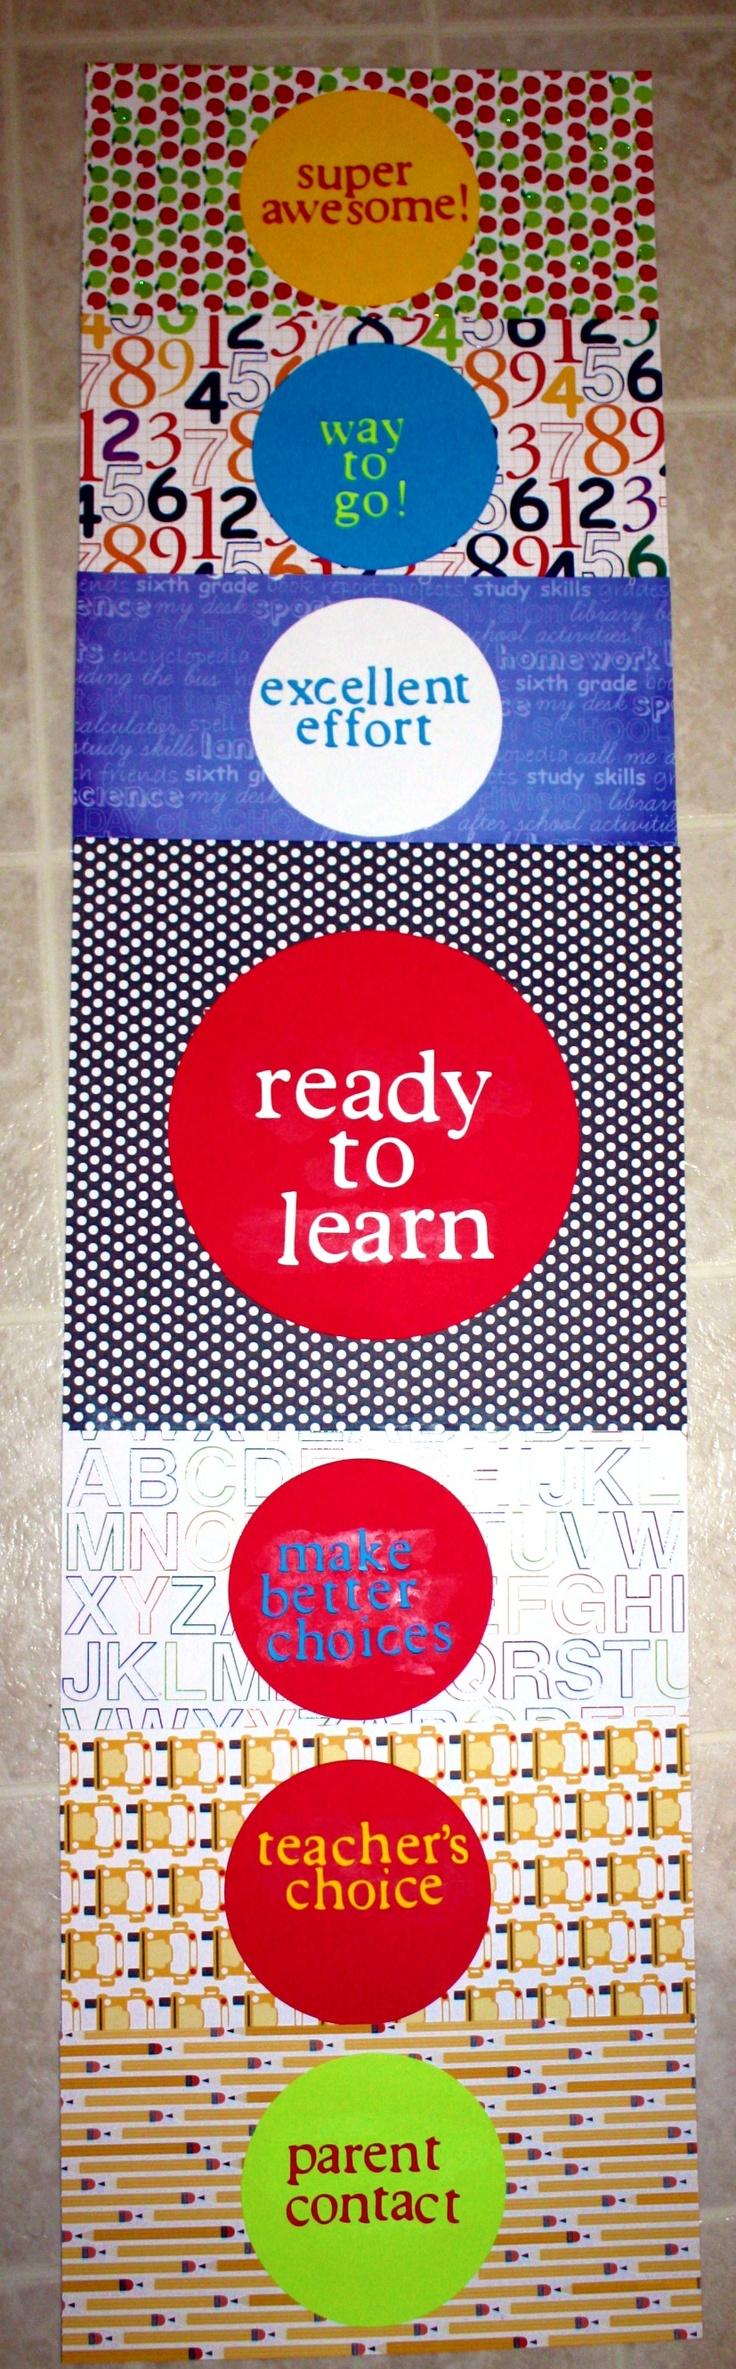 50 best Teaching: Cricut classroom images on Pinterest | Classroom ...